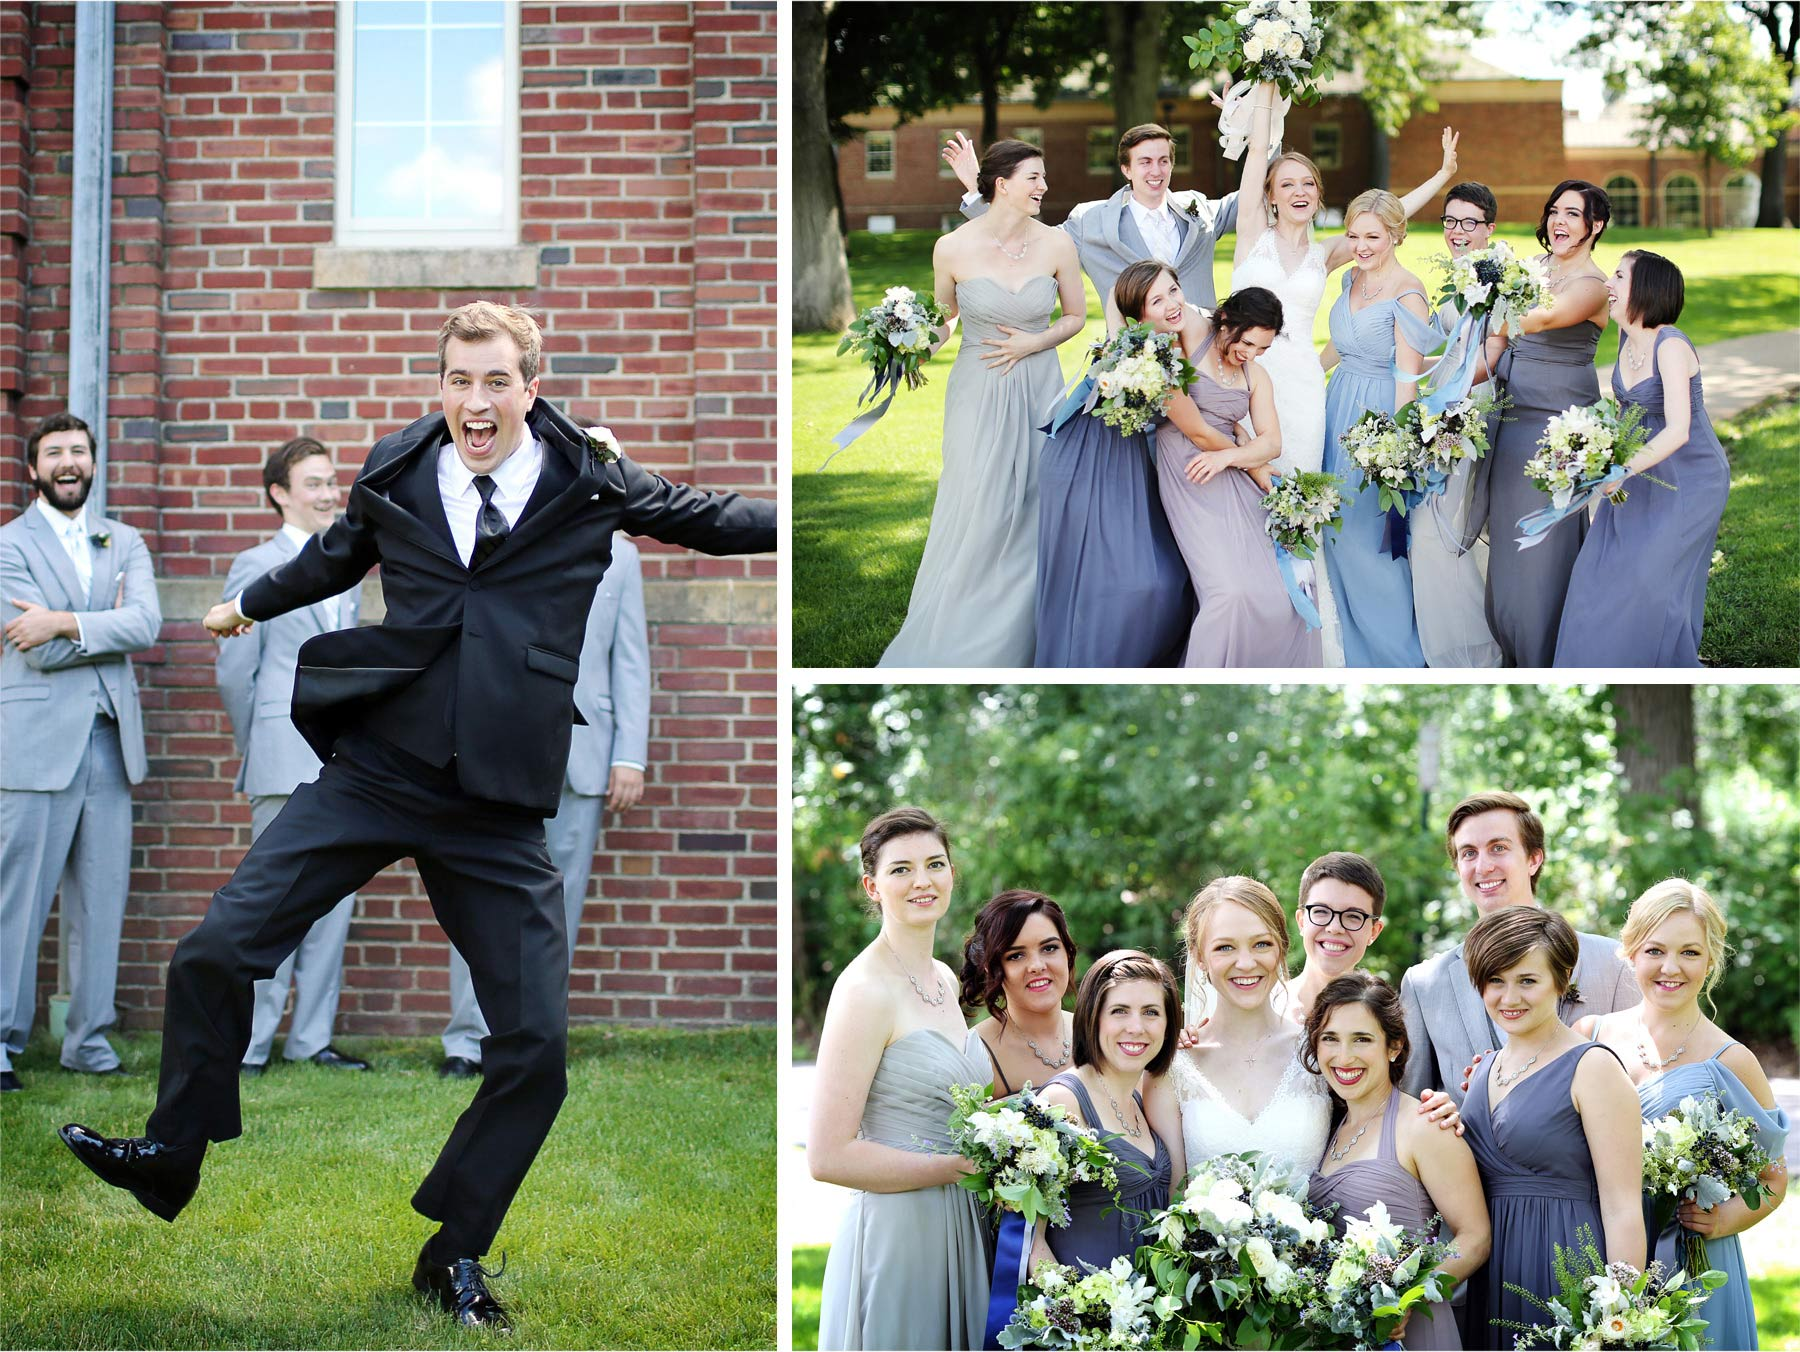 12-Edina-Minnesota-Wedding-Photographer-by-Andrew-Vick-Photography-Summer-Our-Lady-of-Grace-Catholic-Parish-Church-Bride-Groom-Laughter-Jumping-Bridal-Party-Groomsmen-Bridesmaids-Betsy-and-Jon.jpg